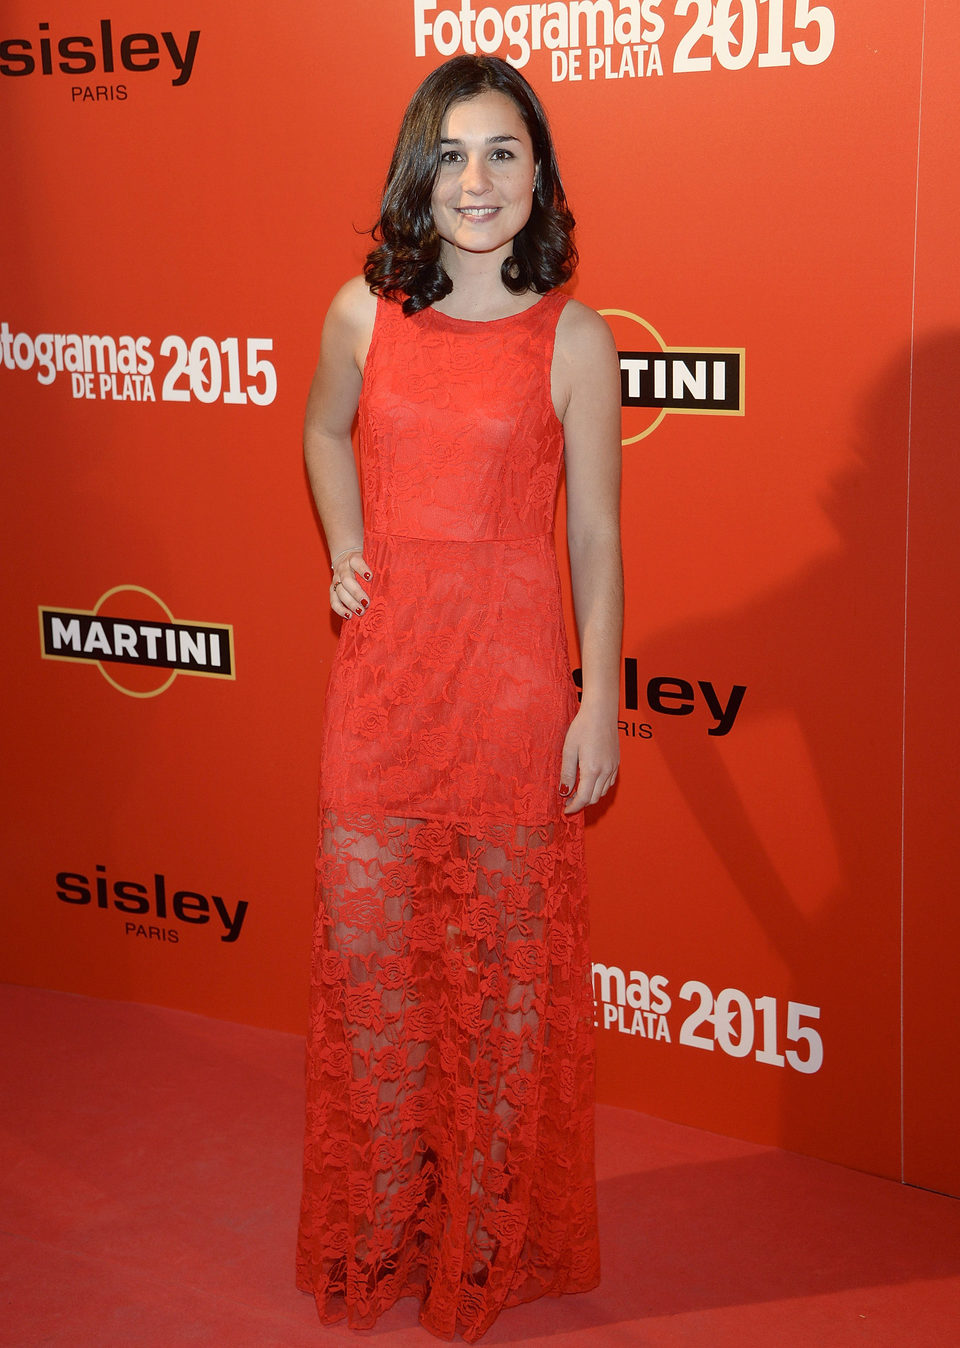 Nadia de Santiago en la alfombra roja de los Fotogramas de Plata 2015